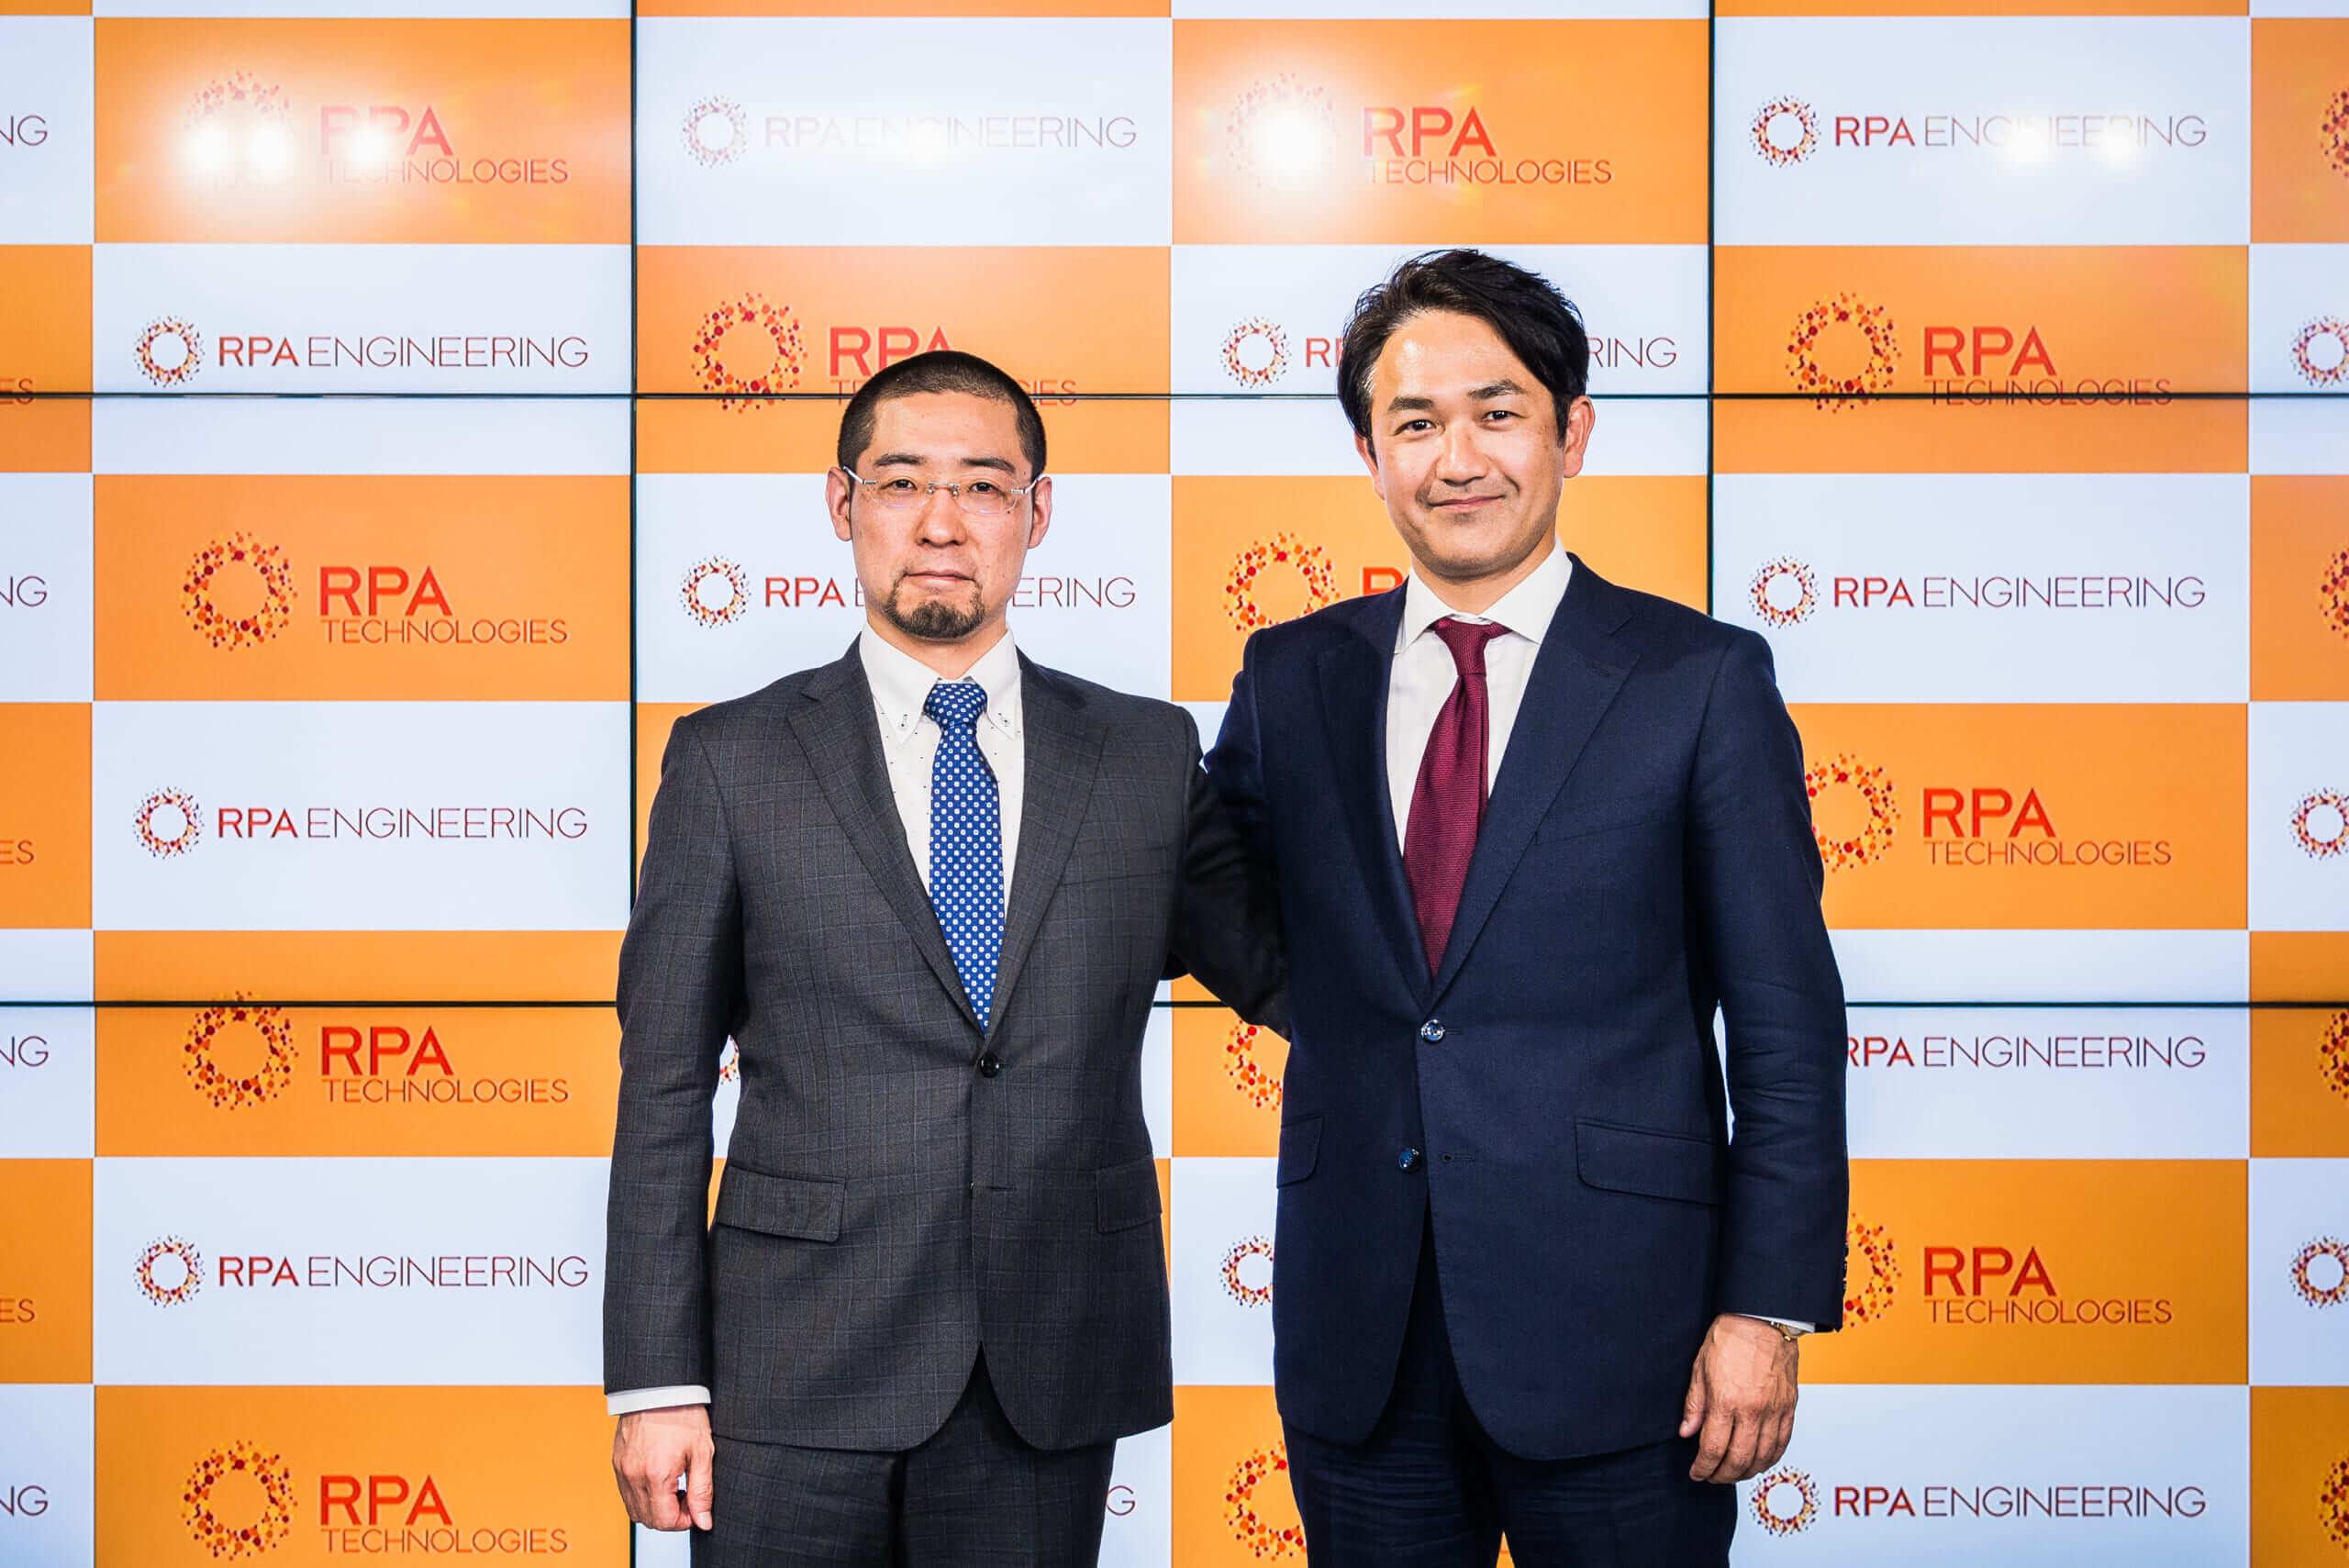 RPAをブームに!新市場の啓蒙とカテゴリーリーダーのポジションを確立した上場PR